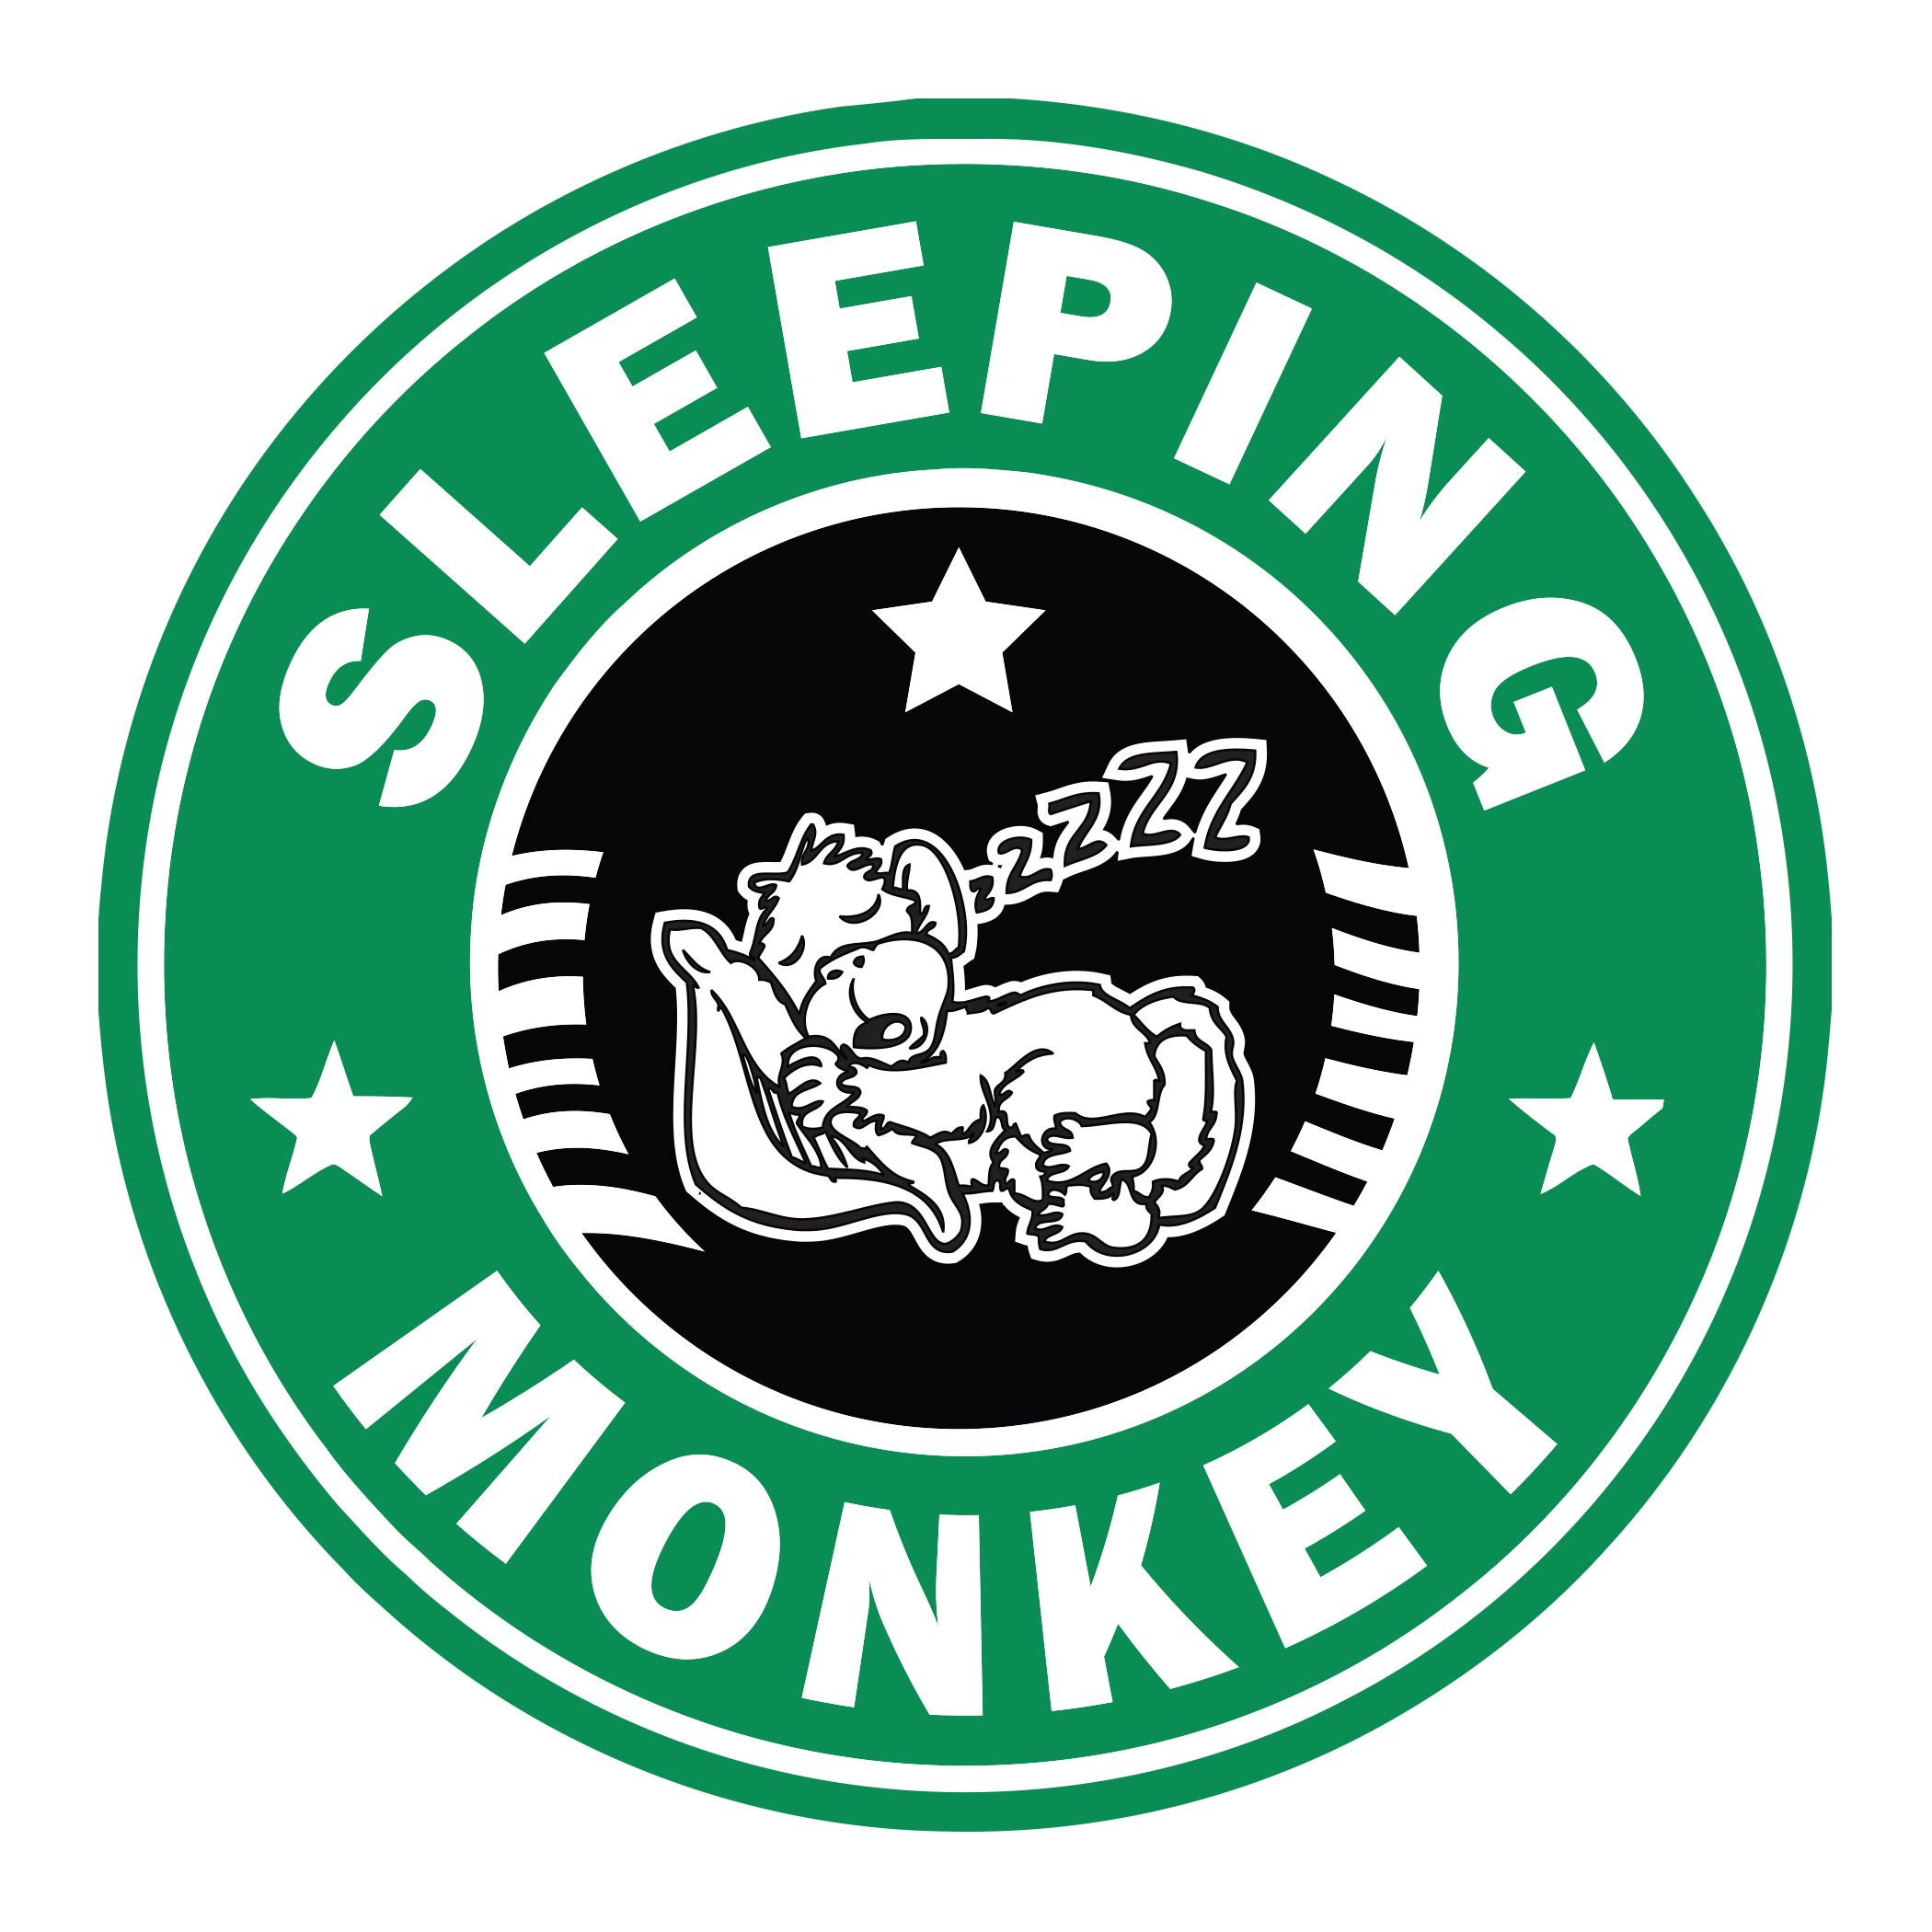 Sleeping Monkey Sticker